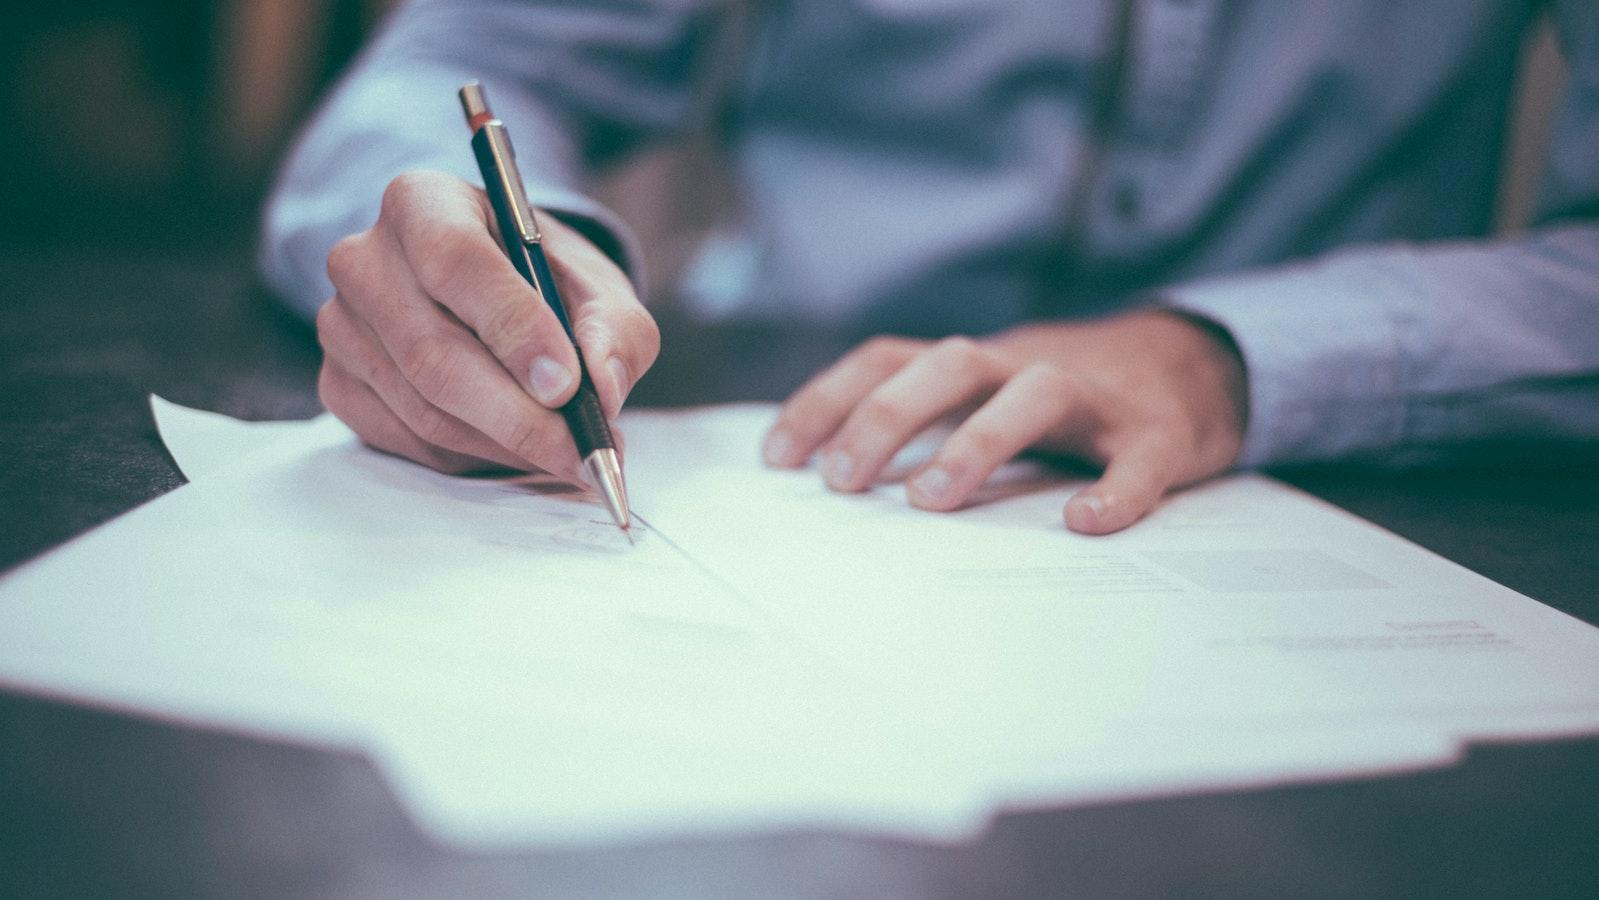 Does Scripture Forbid Entrepreneurs from Raising Big Money?